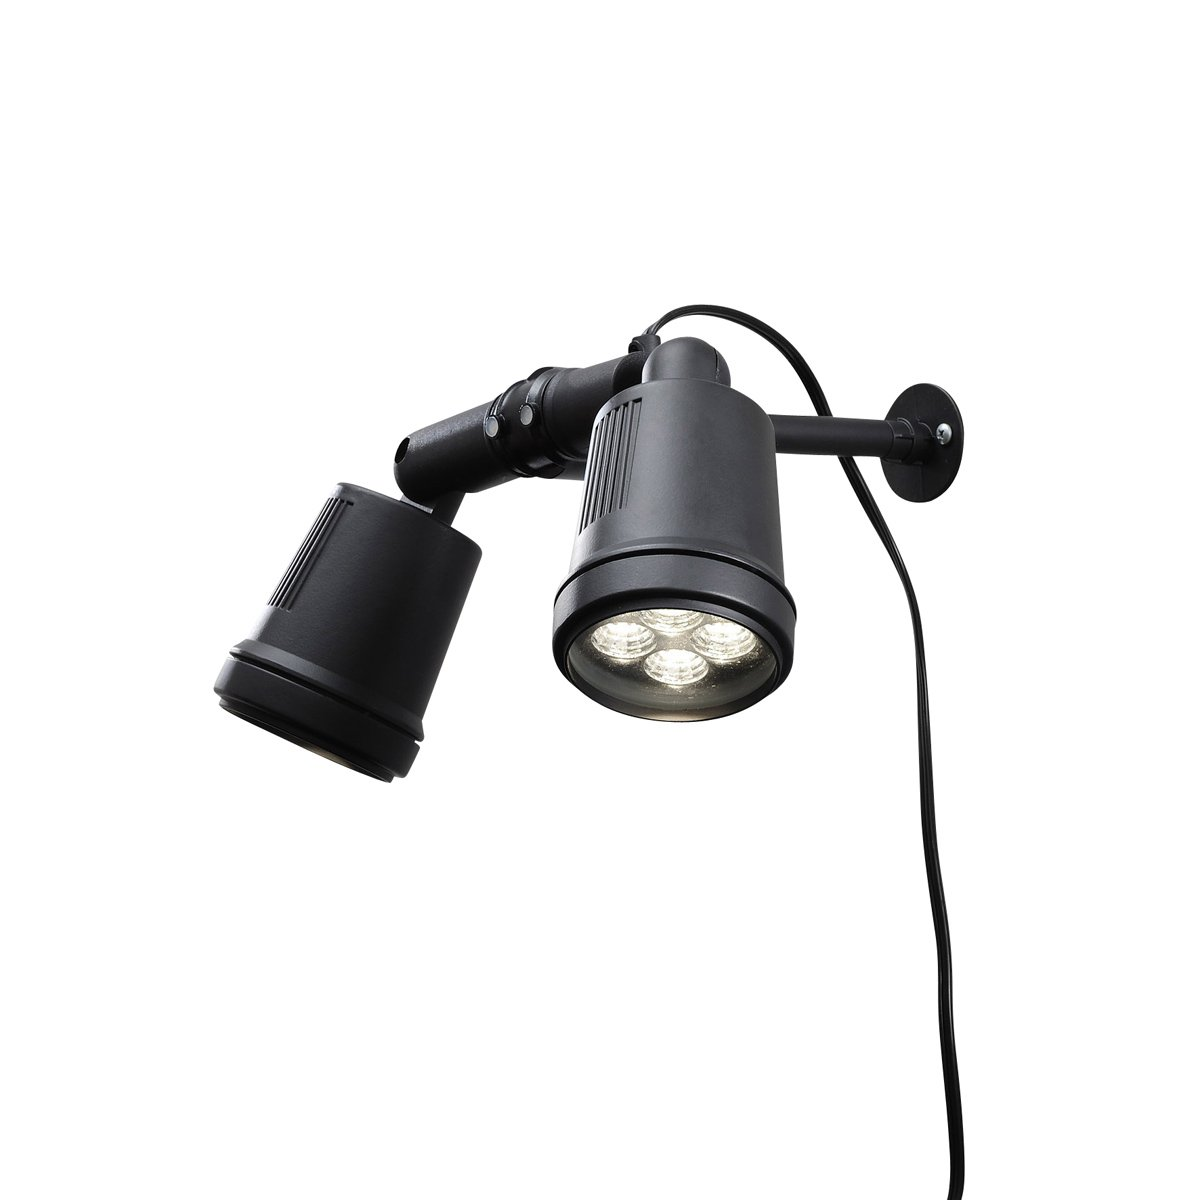 Warm White Konstsmide Effect Amalfi Twin High Power LED Garden Spot Light